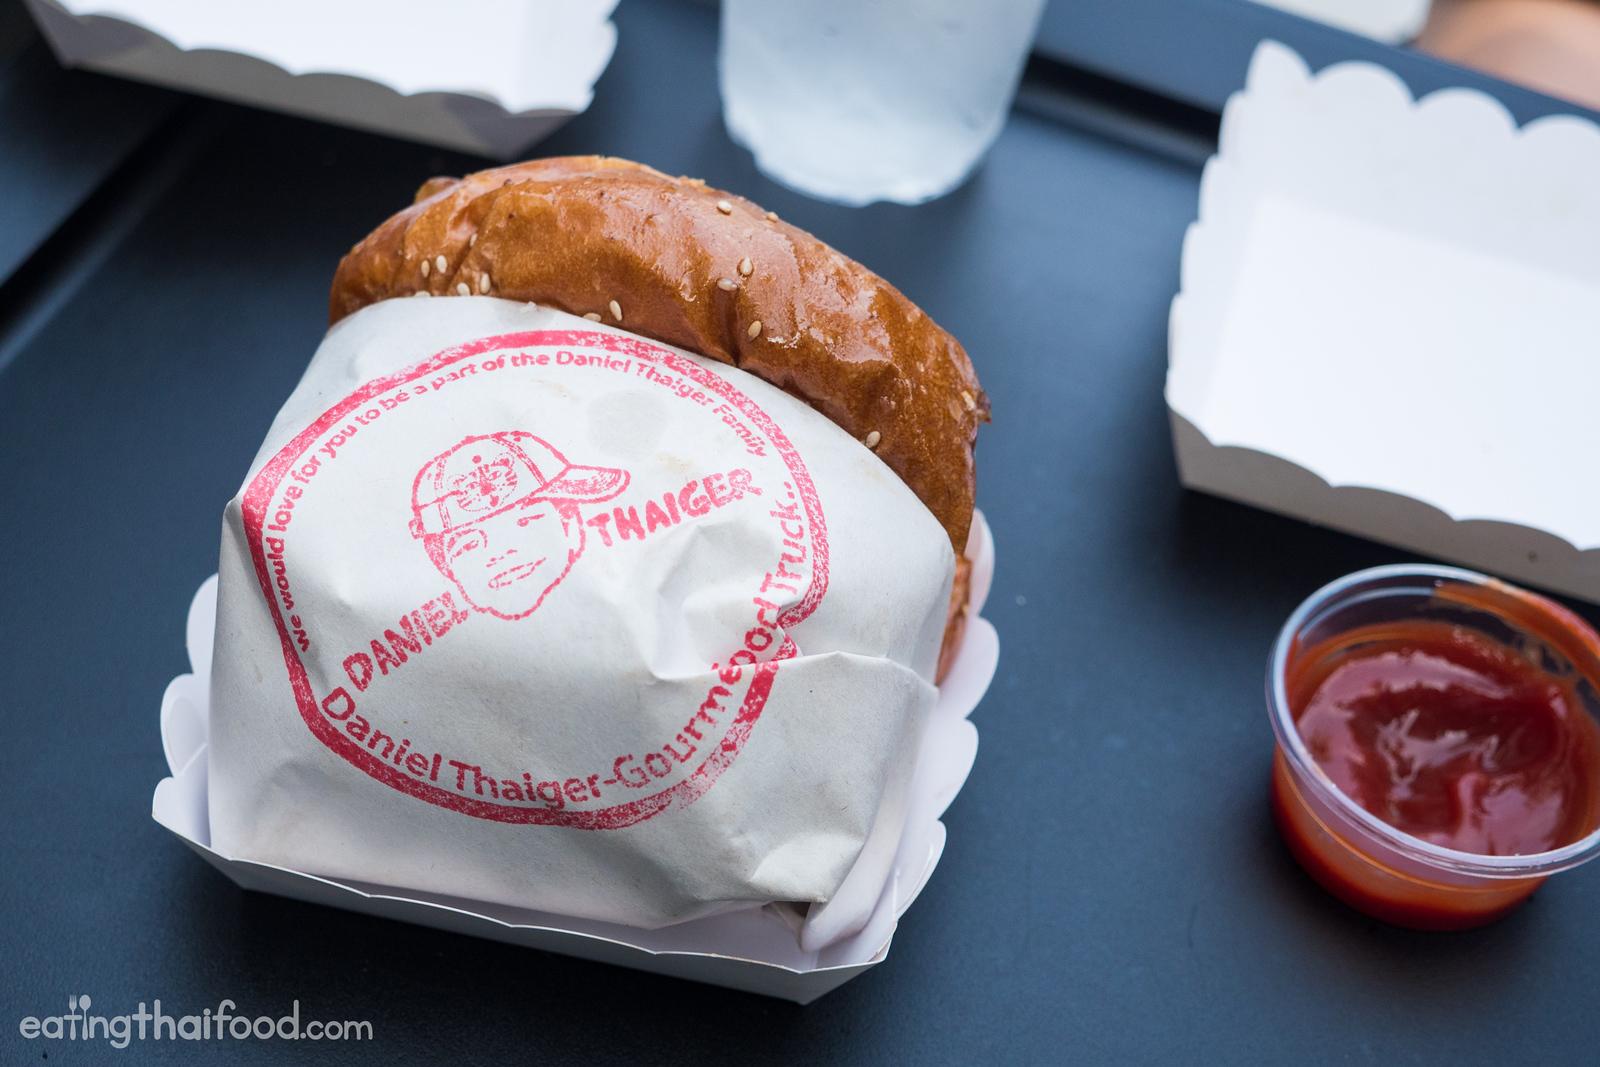 Thaiger burger